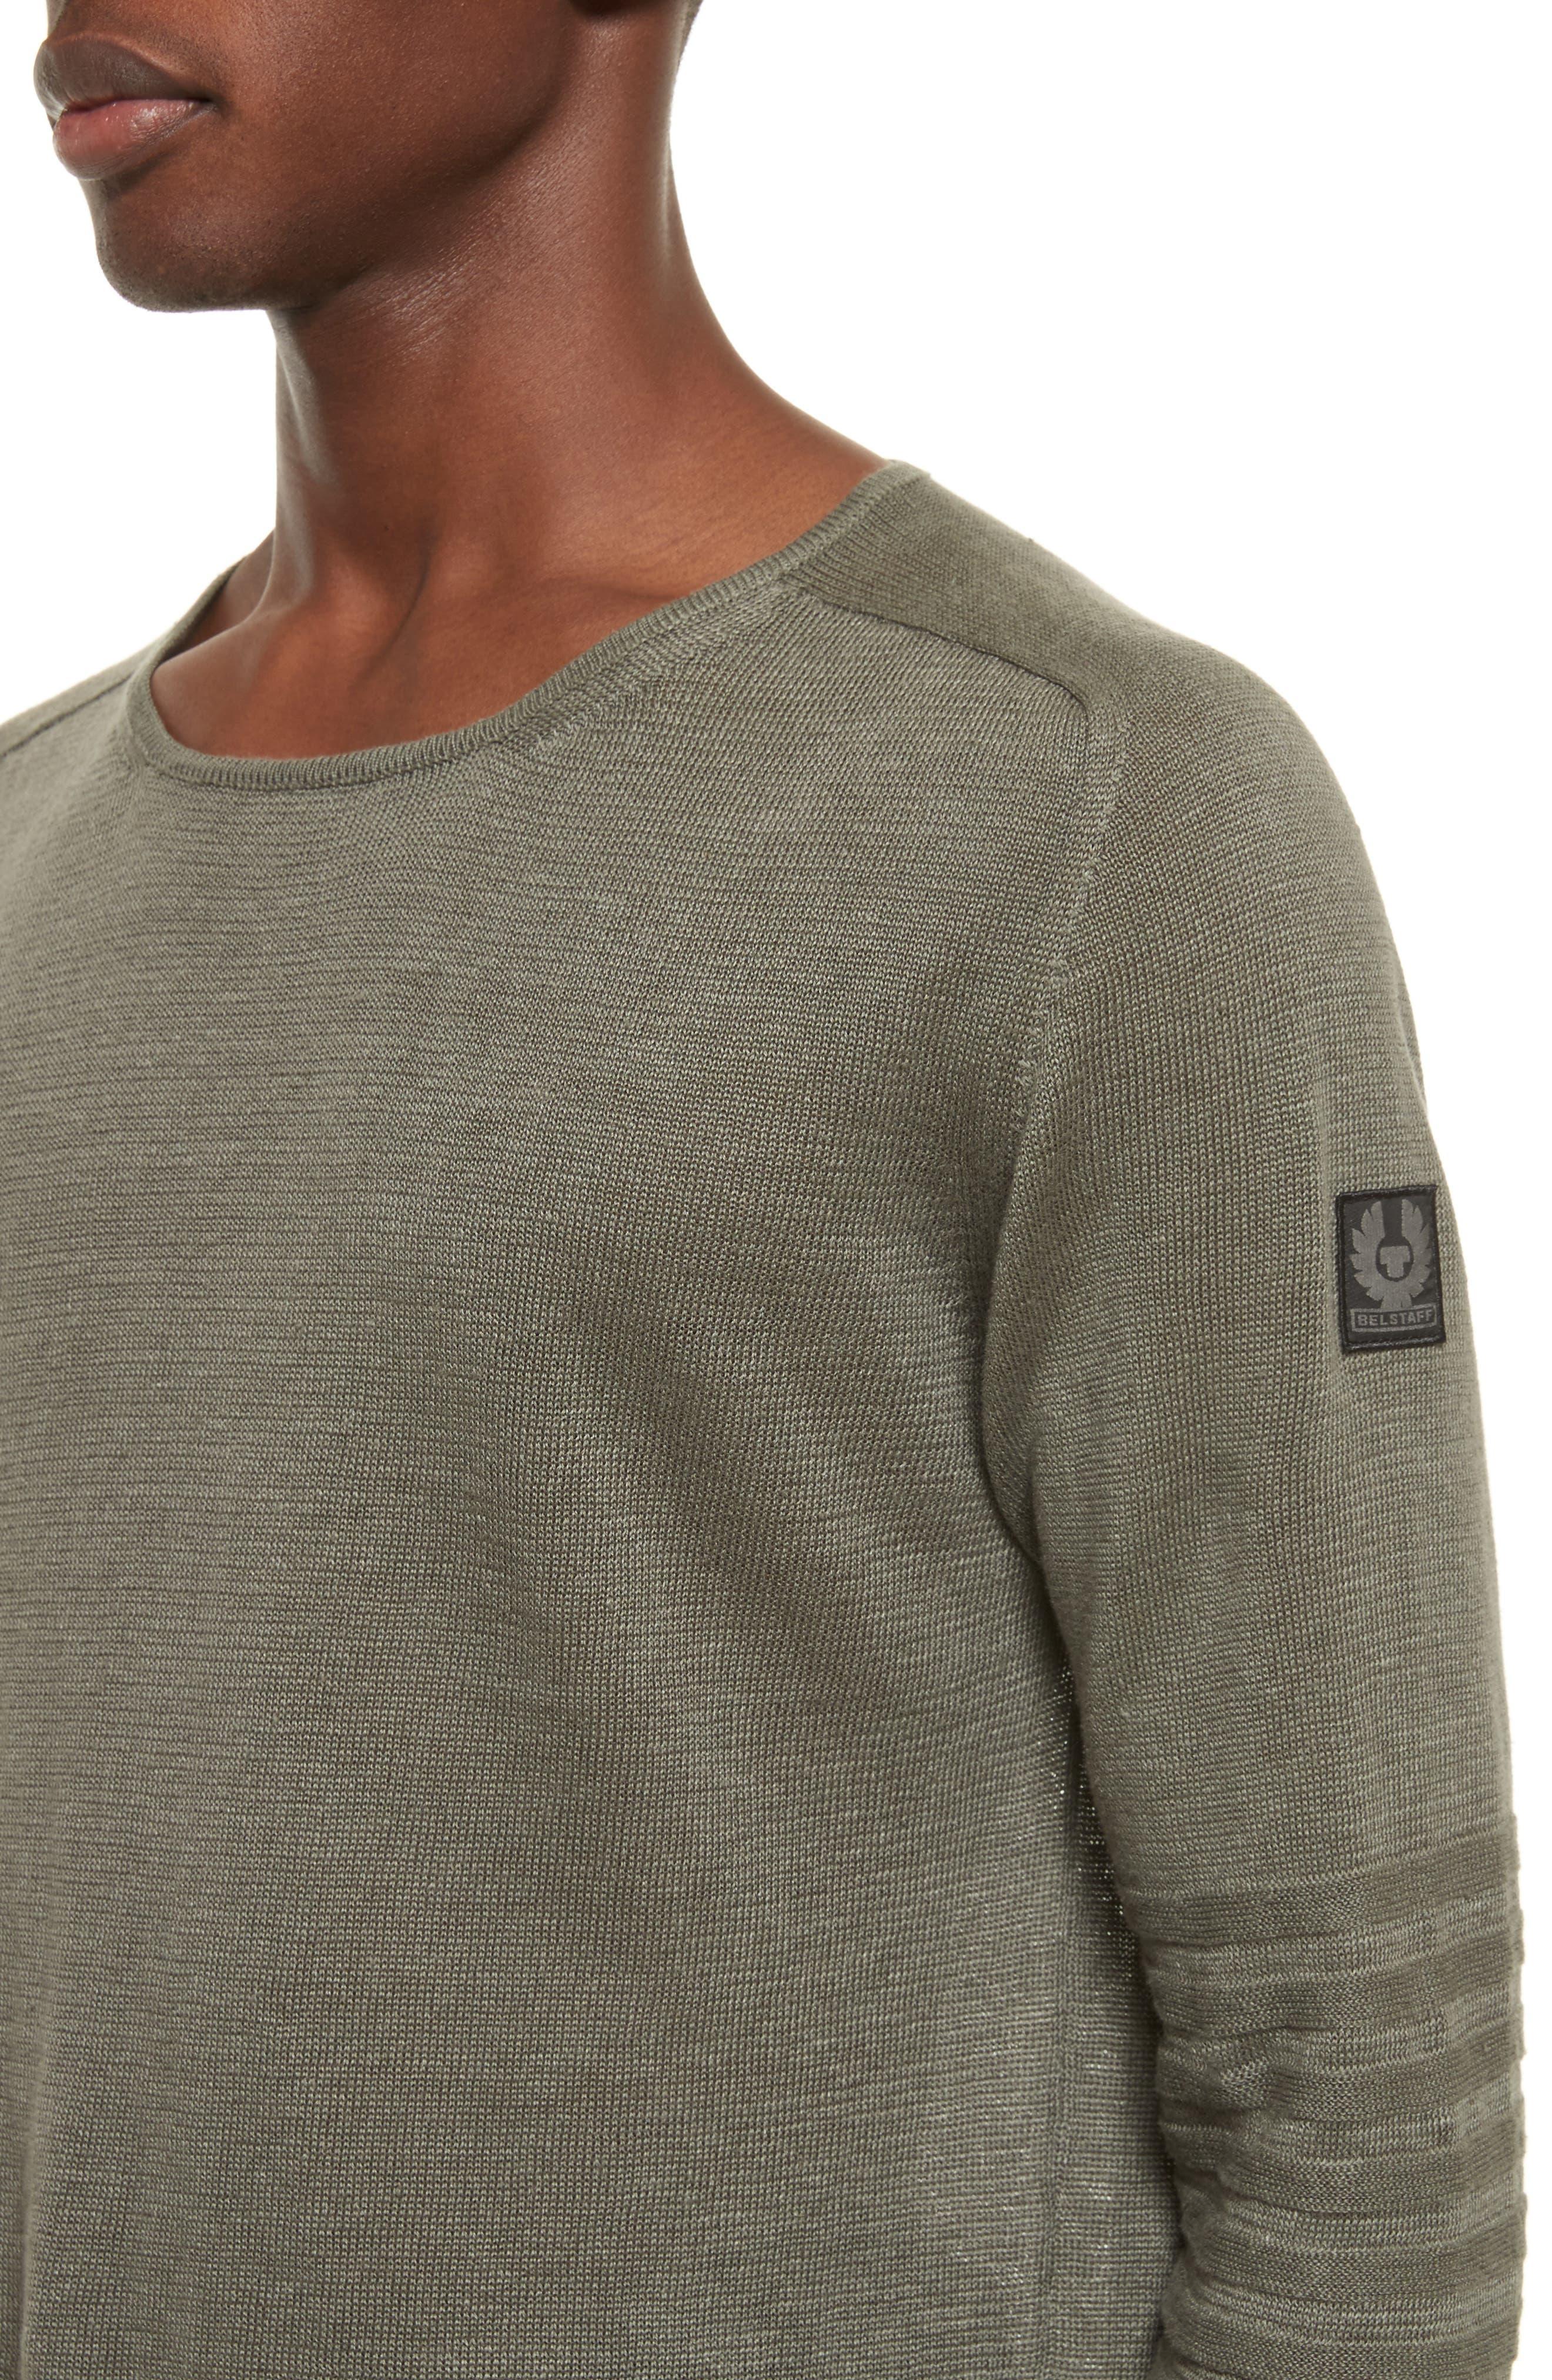 Exford Linen Crewneck Sweater,                             Alternate thumbnail 8, color,